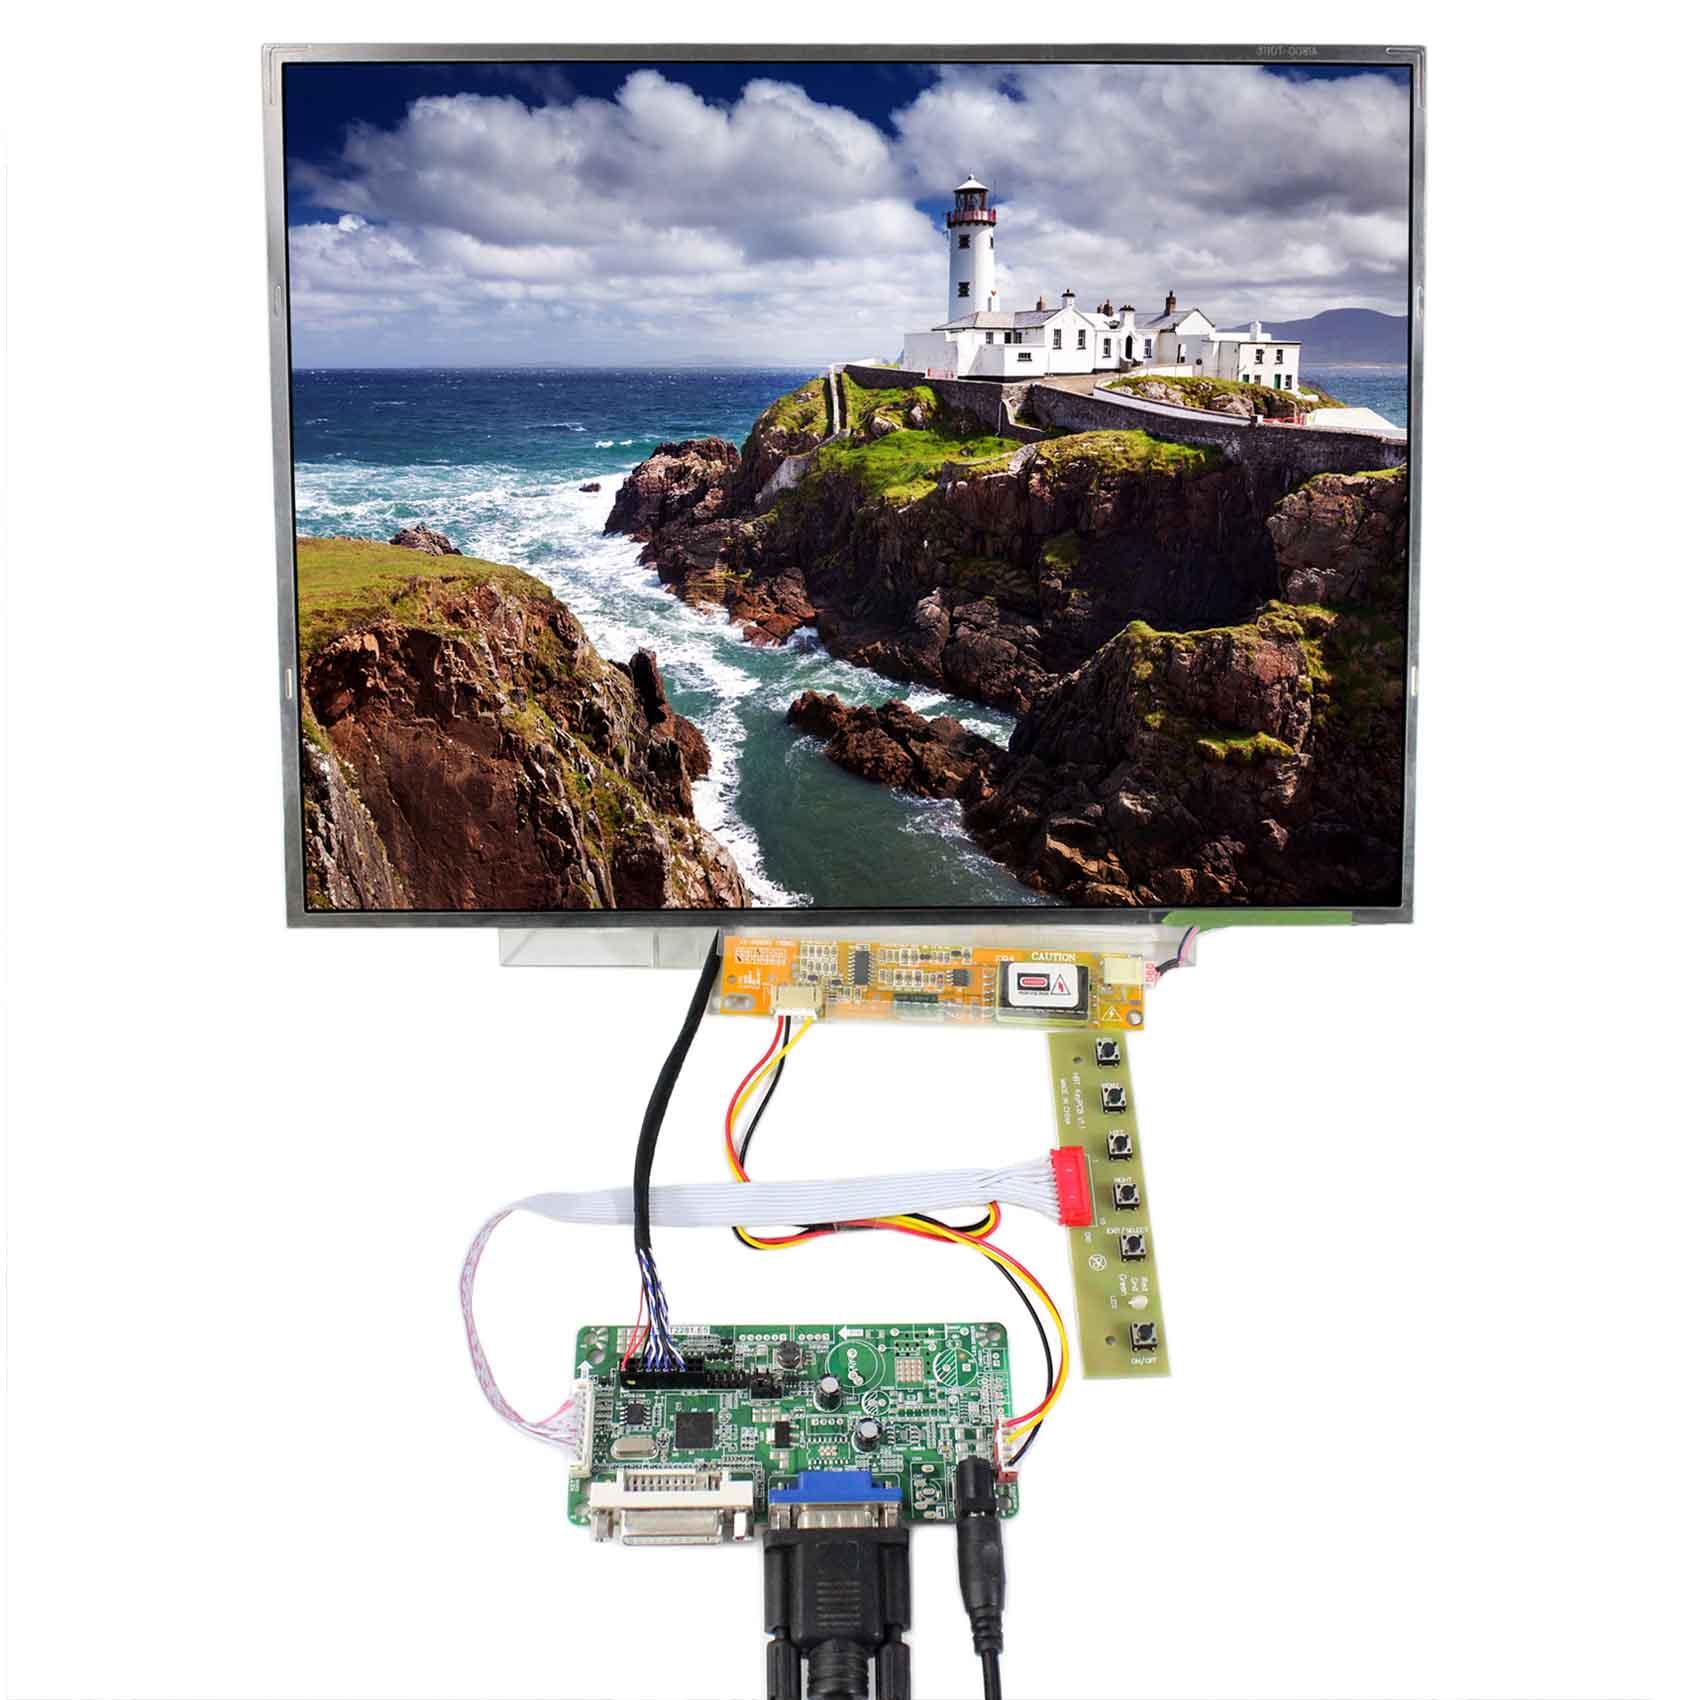 DVI VGA lcd controller board with 15inch 1024x768 B150XG03 LP150XG08 N150XB Lcd panelDVI VGA lcd controller board with 15inch 1024x768 B150XG03 LP150XG08 N150XB Lcd panel